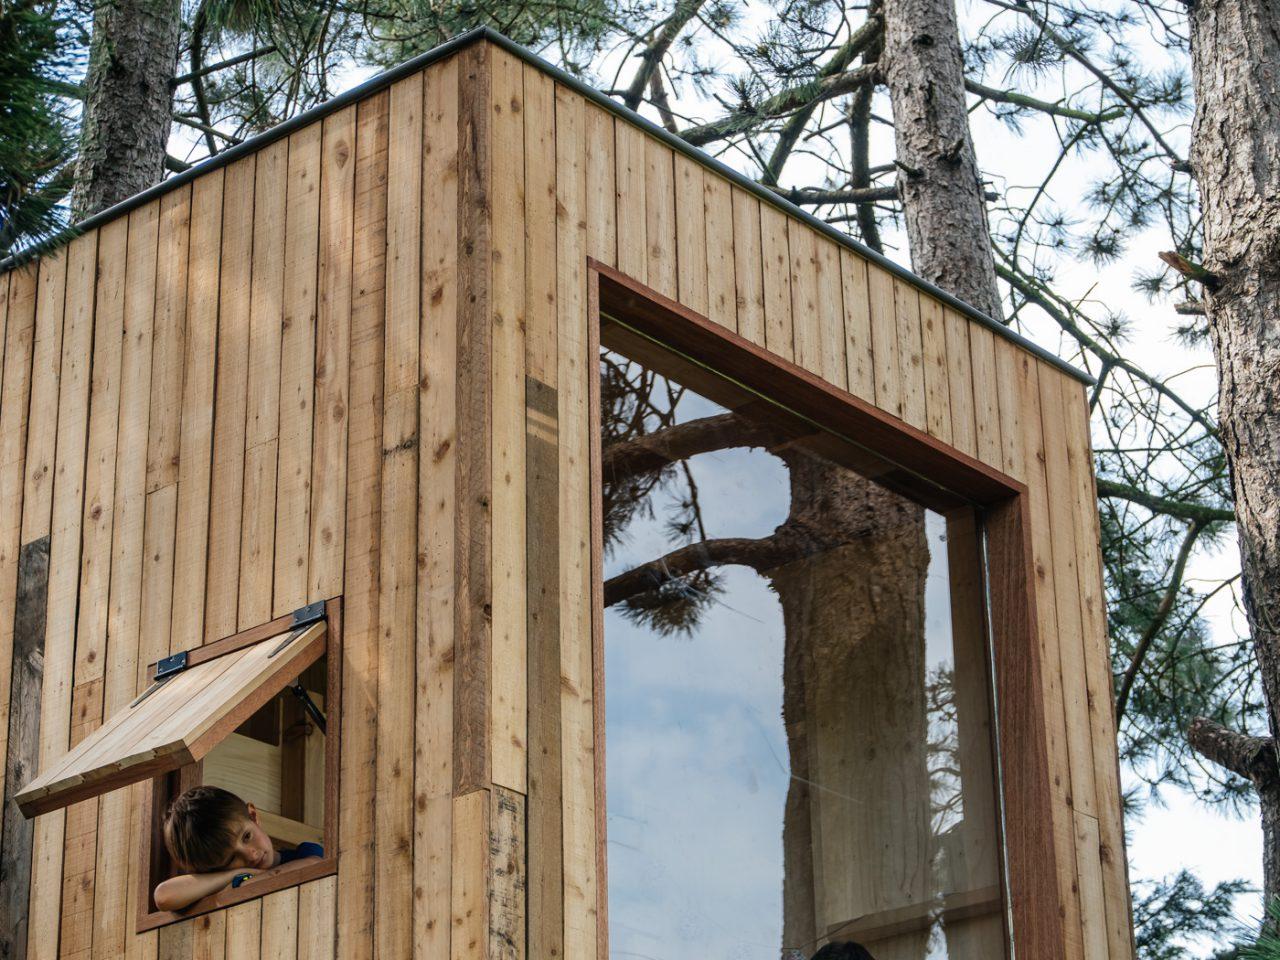 boomterras, boomhut, hout, treehouse, speelhut